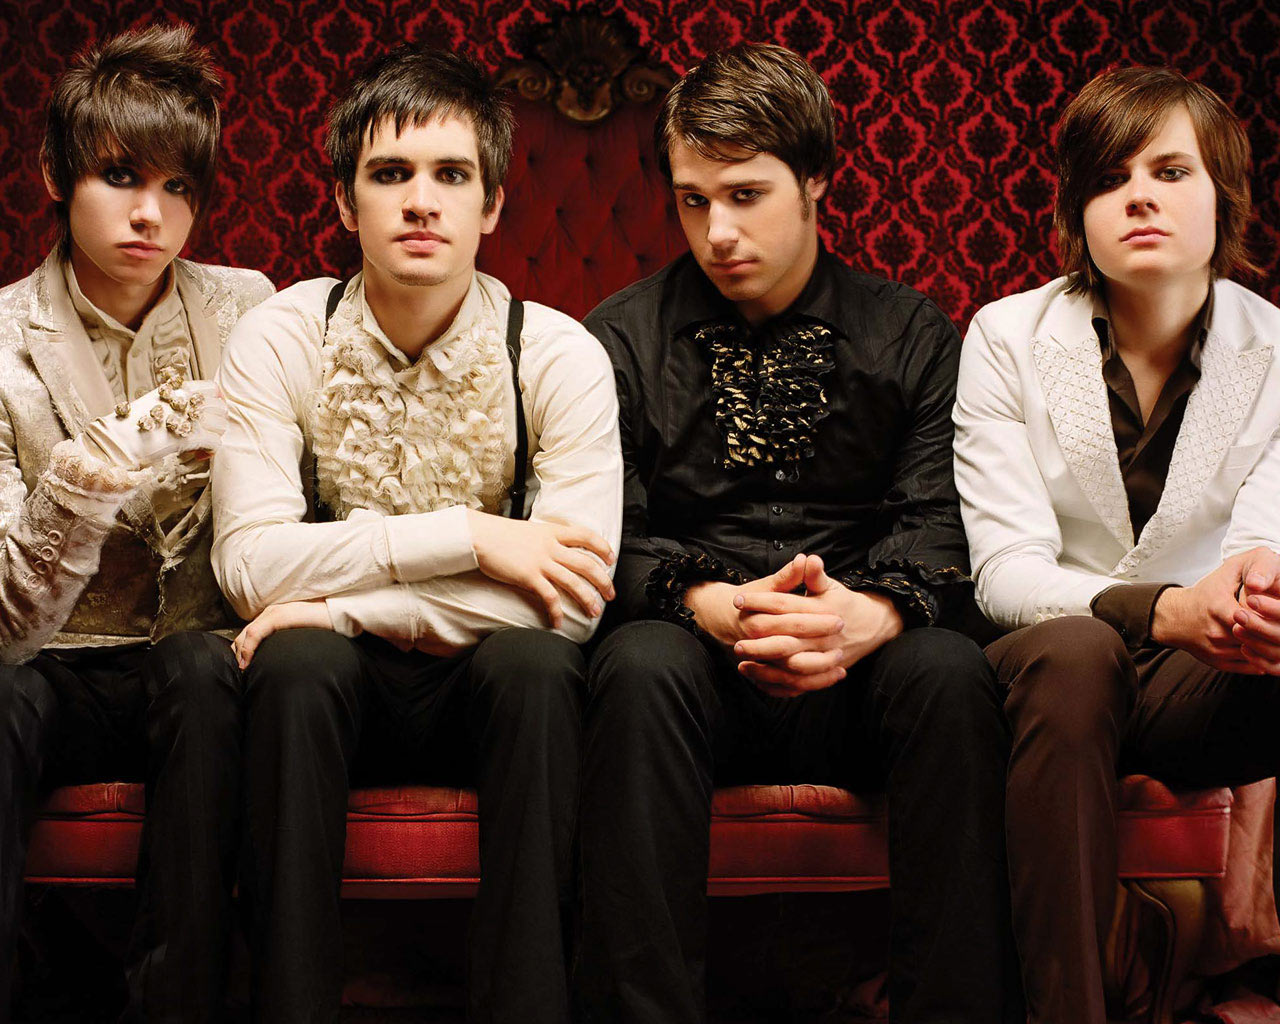 crfxfnm фото группы panic at the disco: